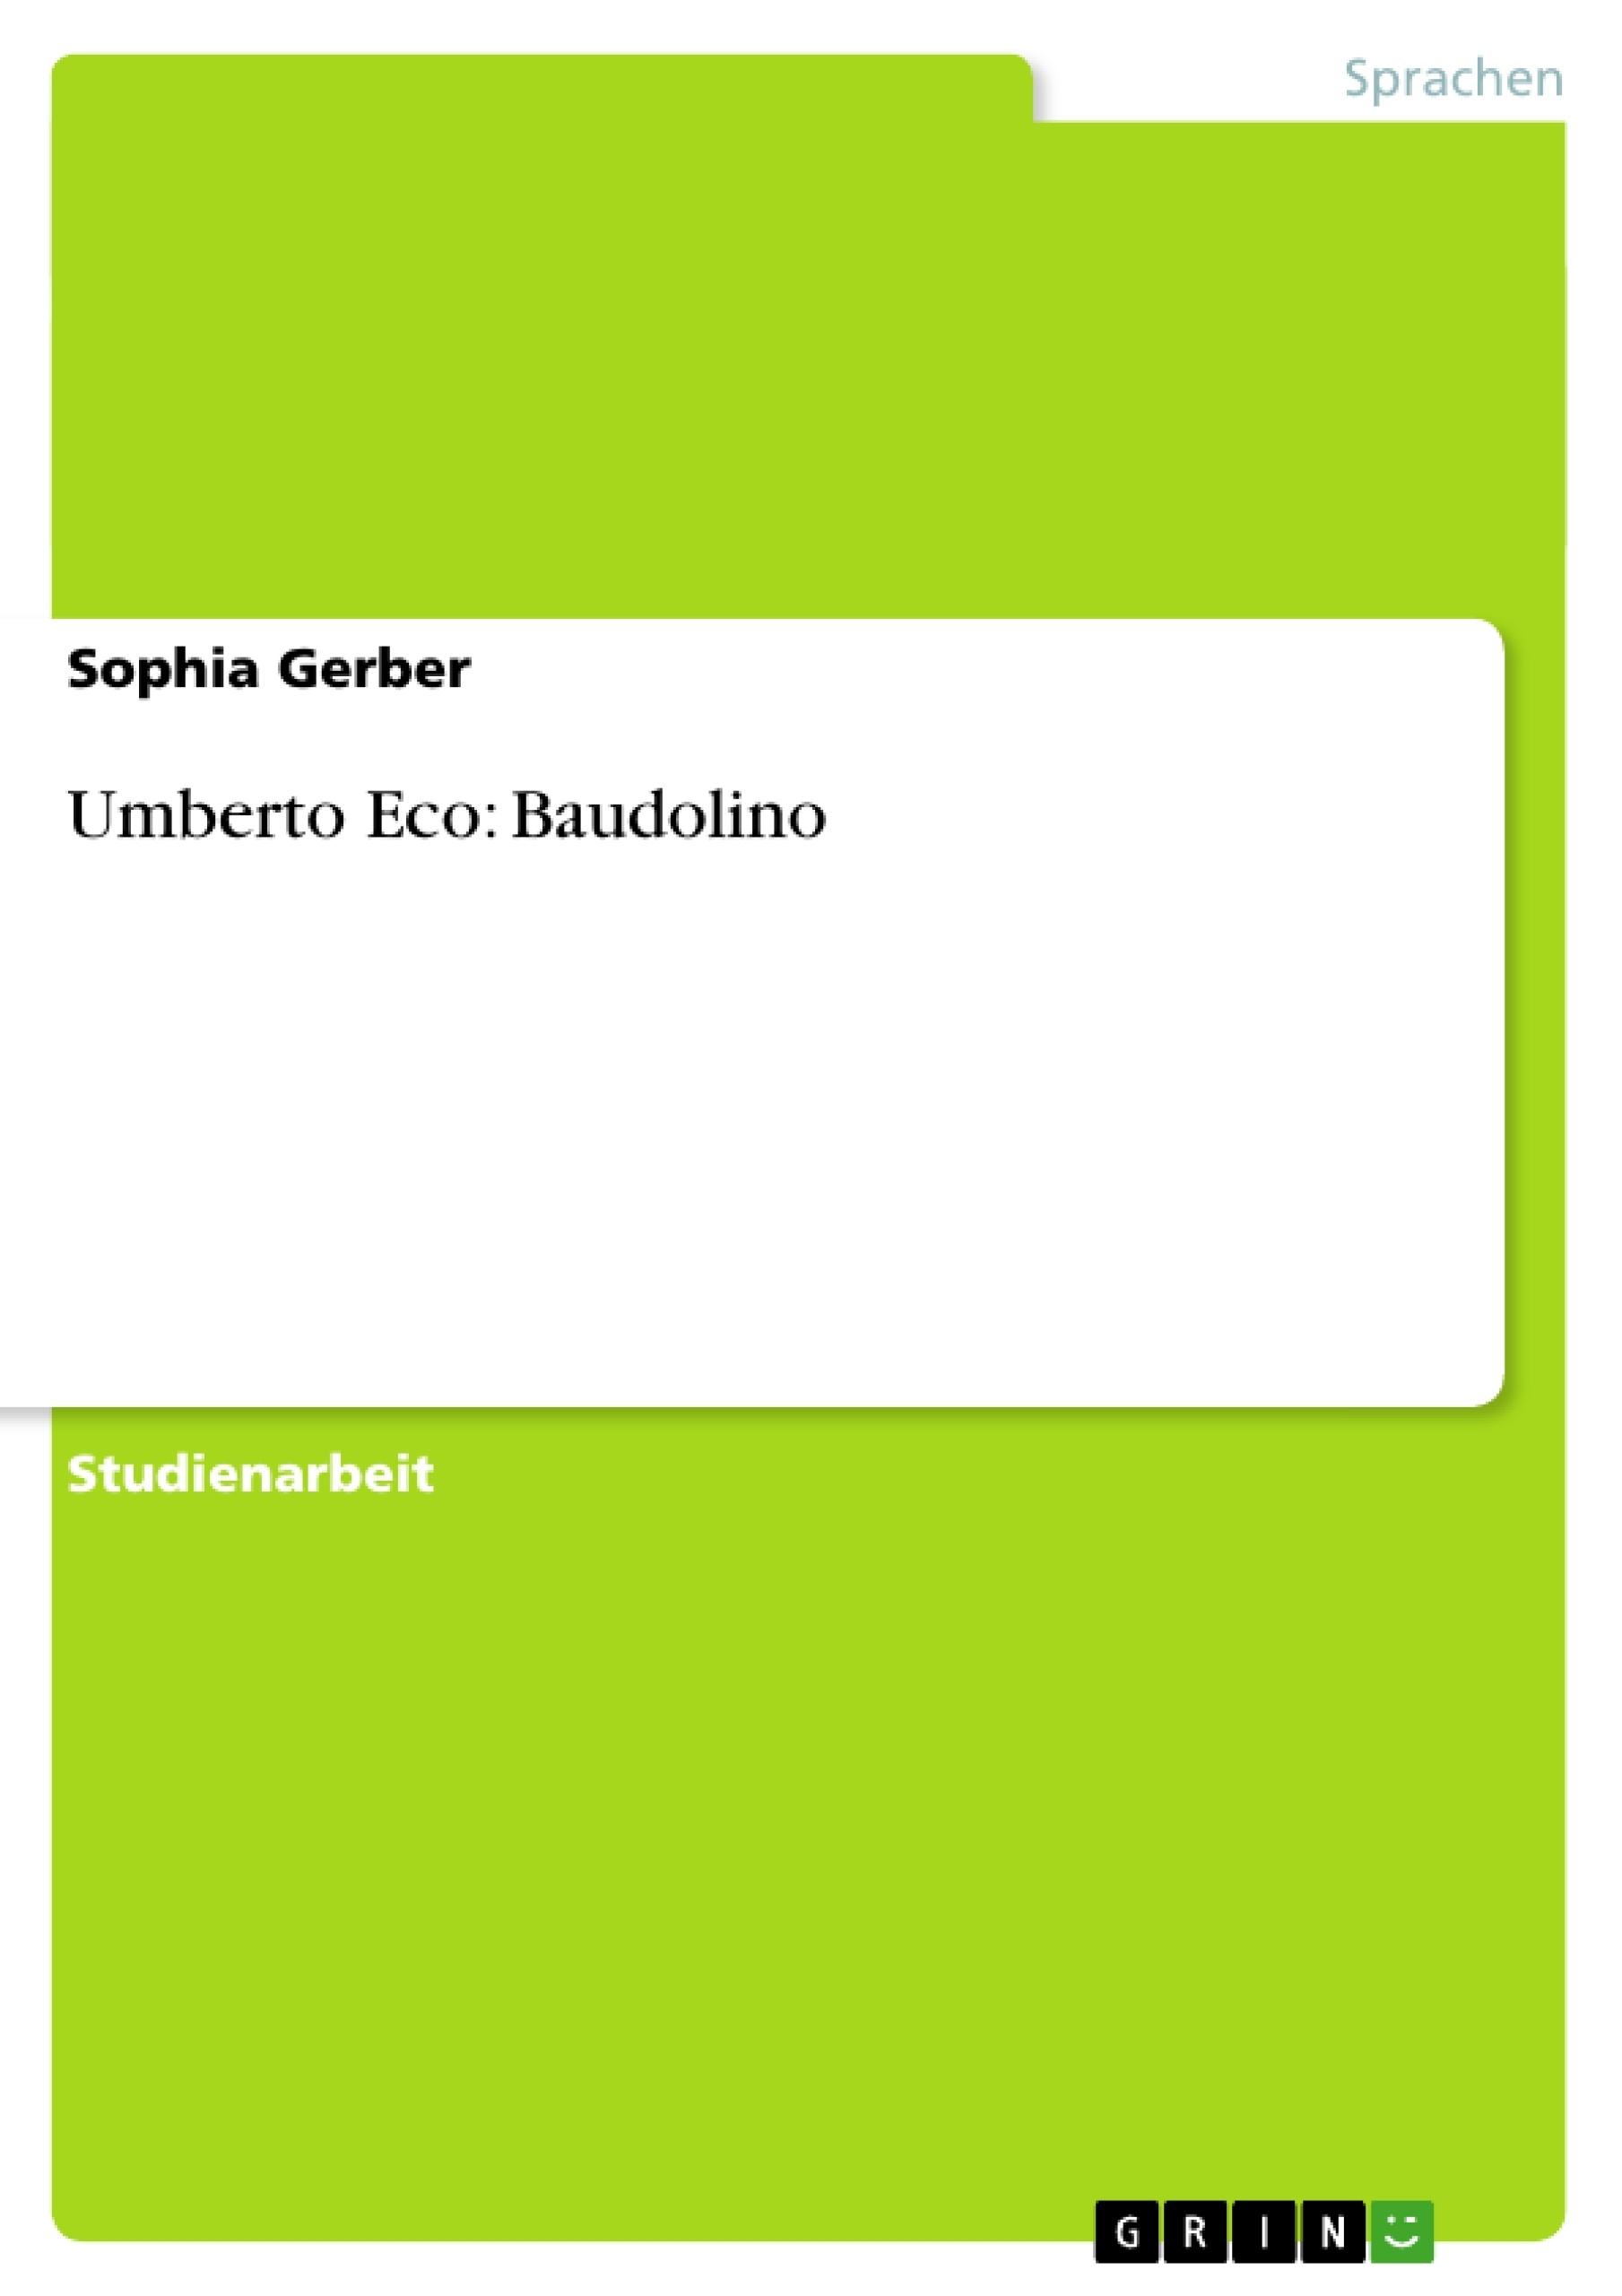 Titel: Umberto Eco: Baudolino